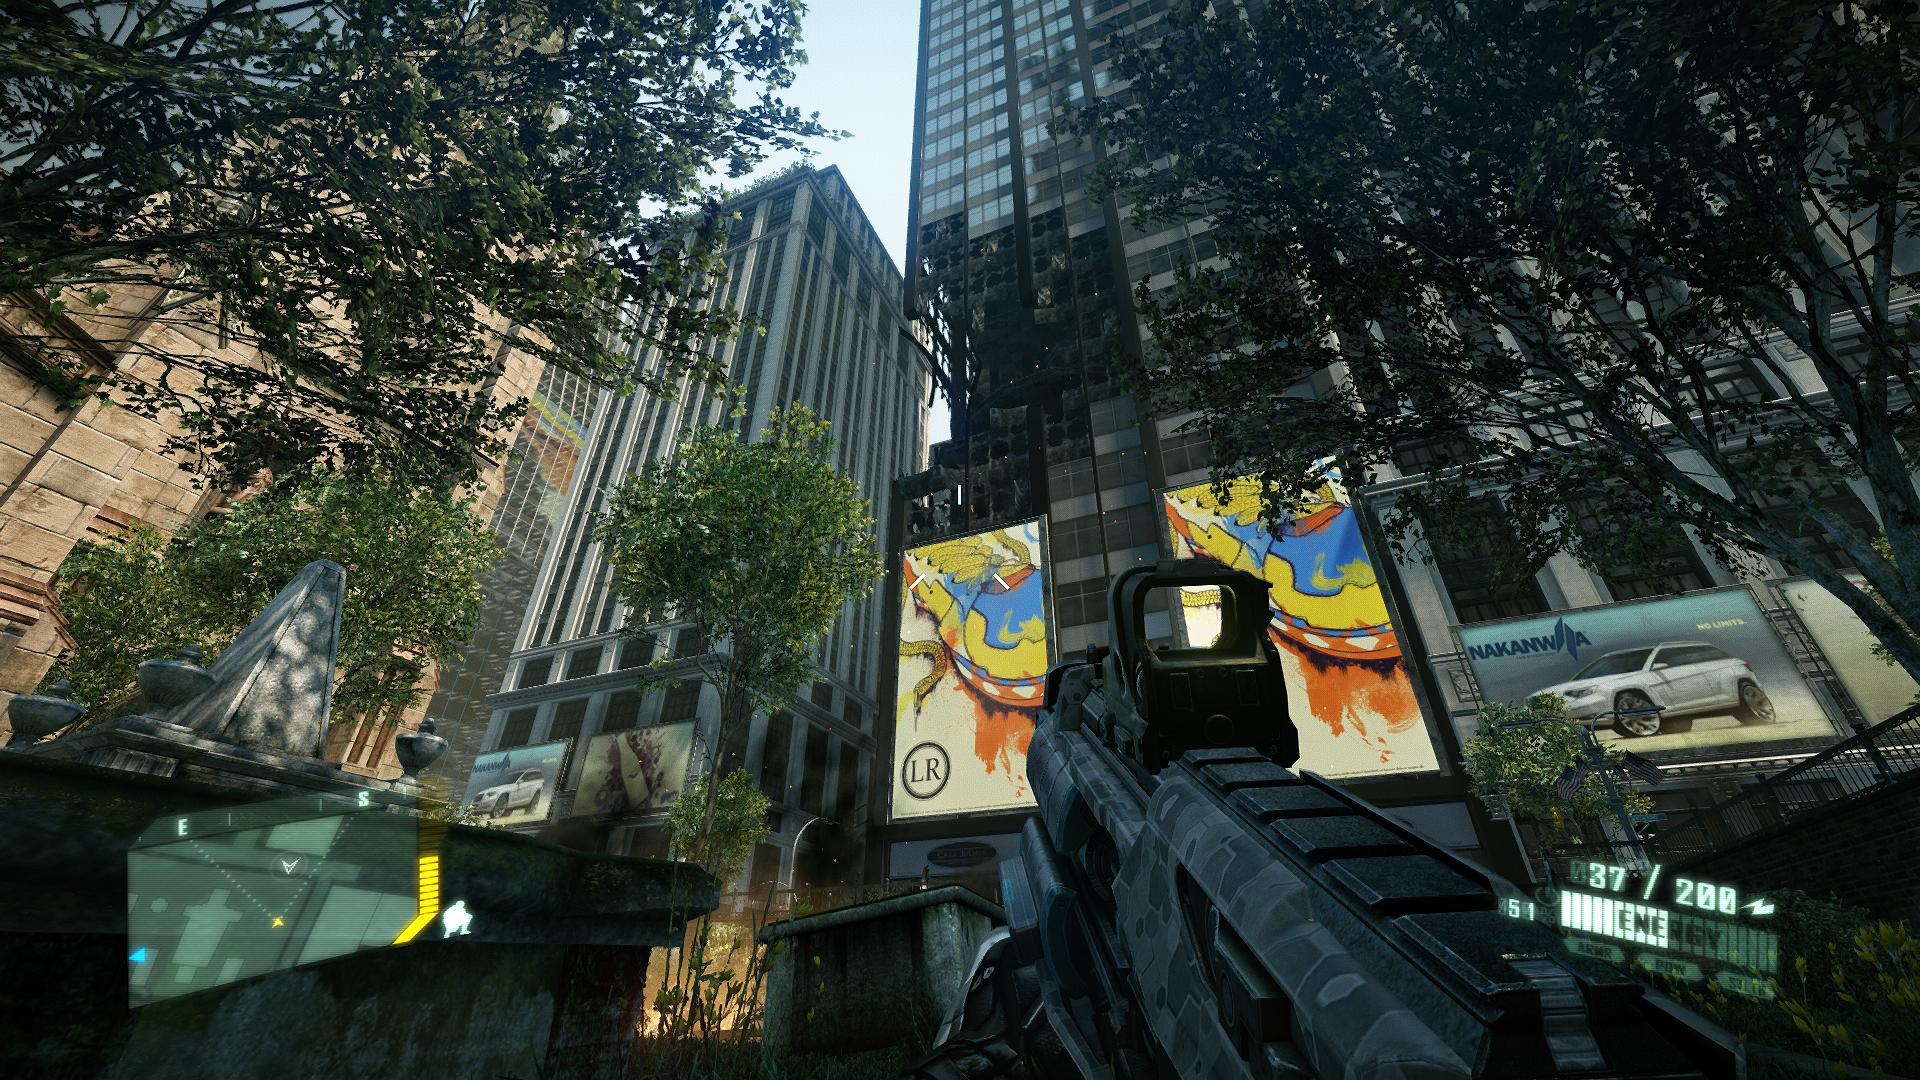 Crytek announces crysis 3 multiplayer beta coming january 29th